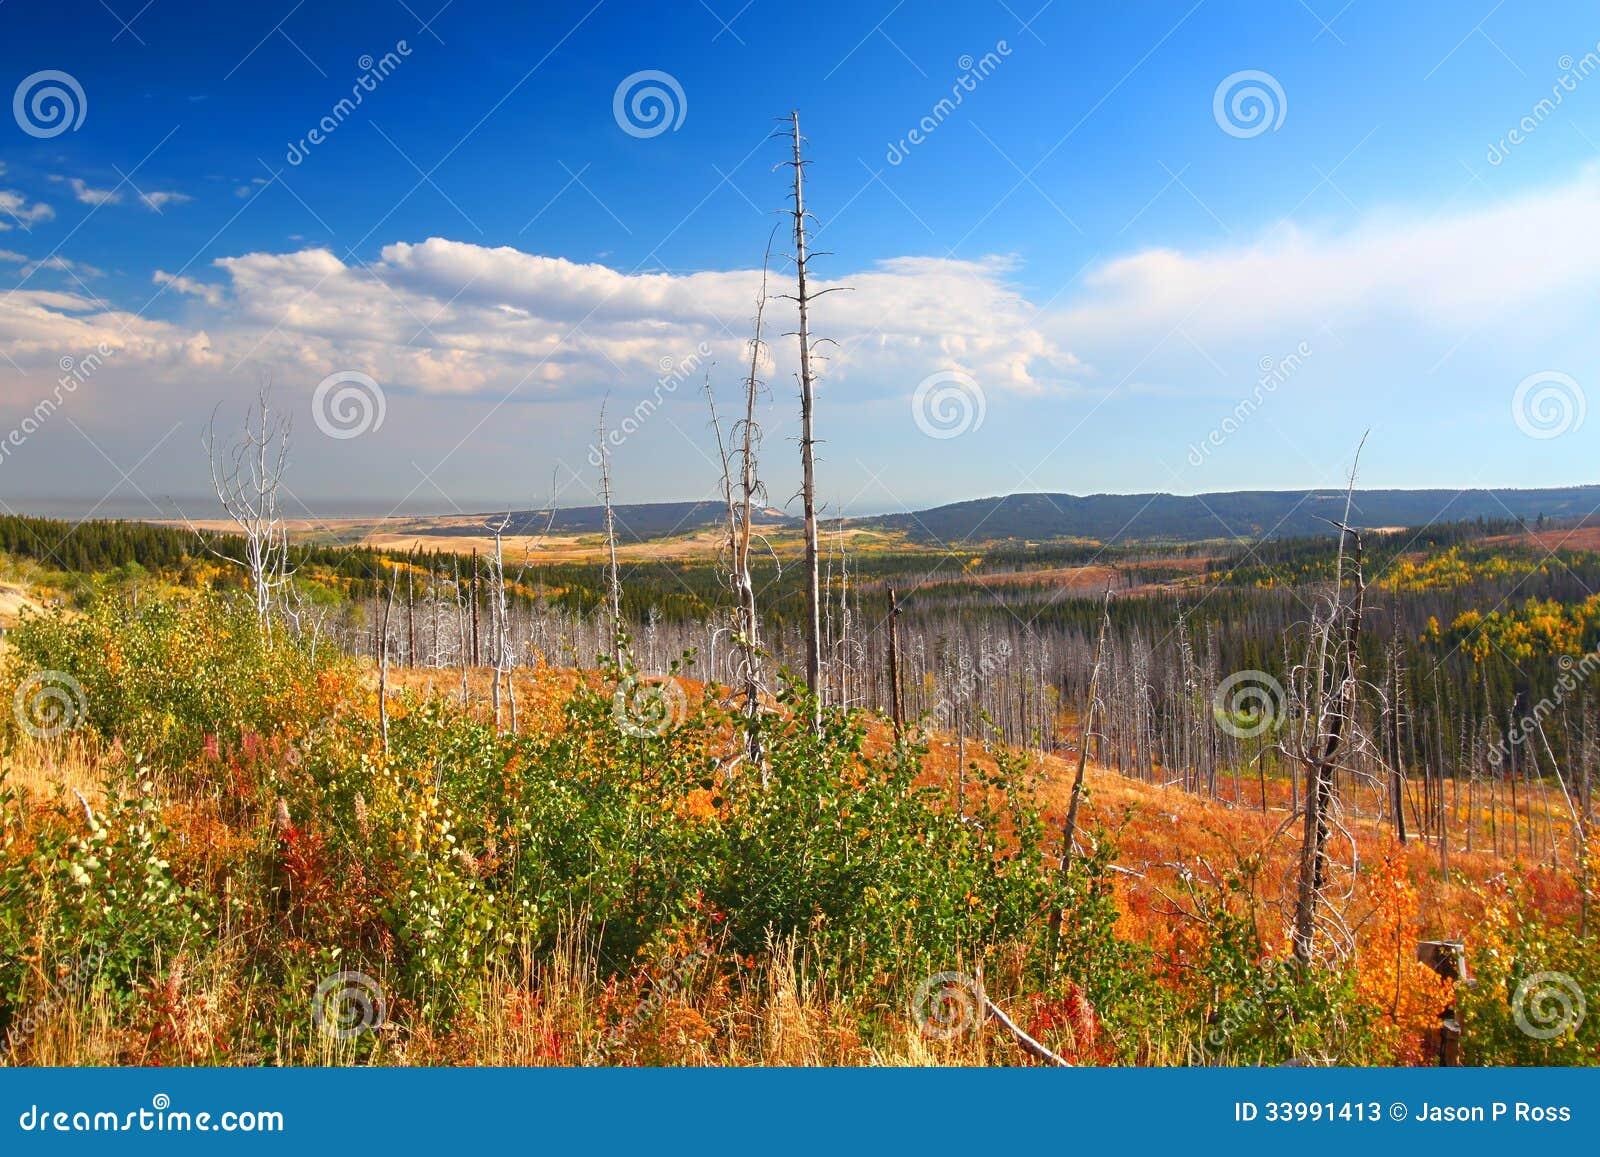 Montana Autumn Scenery